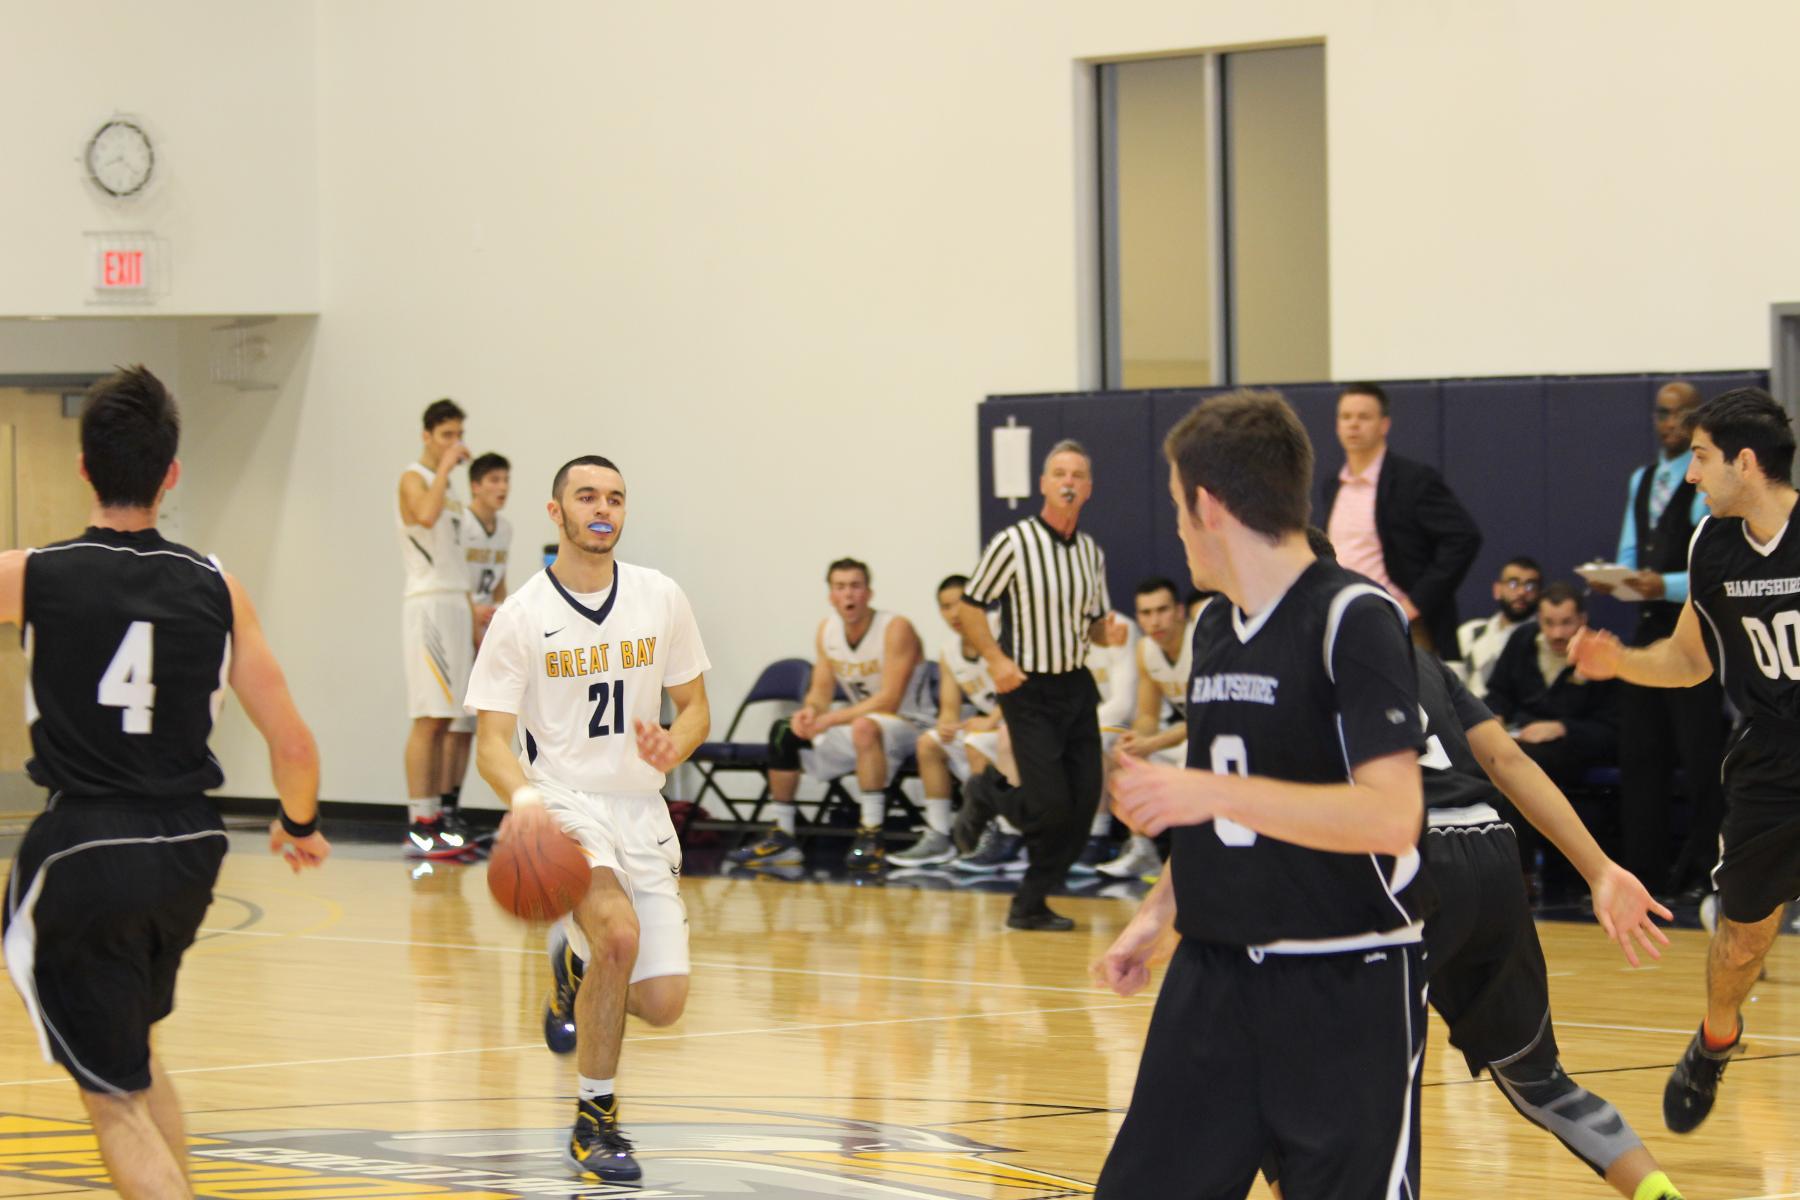 2011 Nba Finals Box Score Game 1 | Basketball Scores